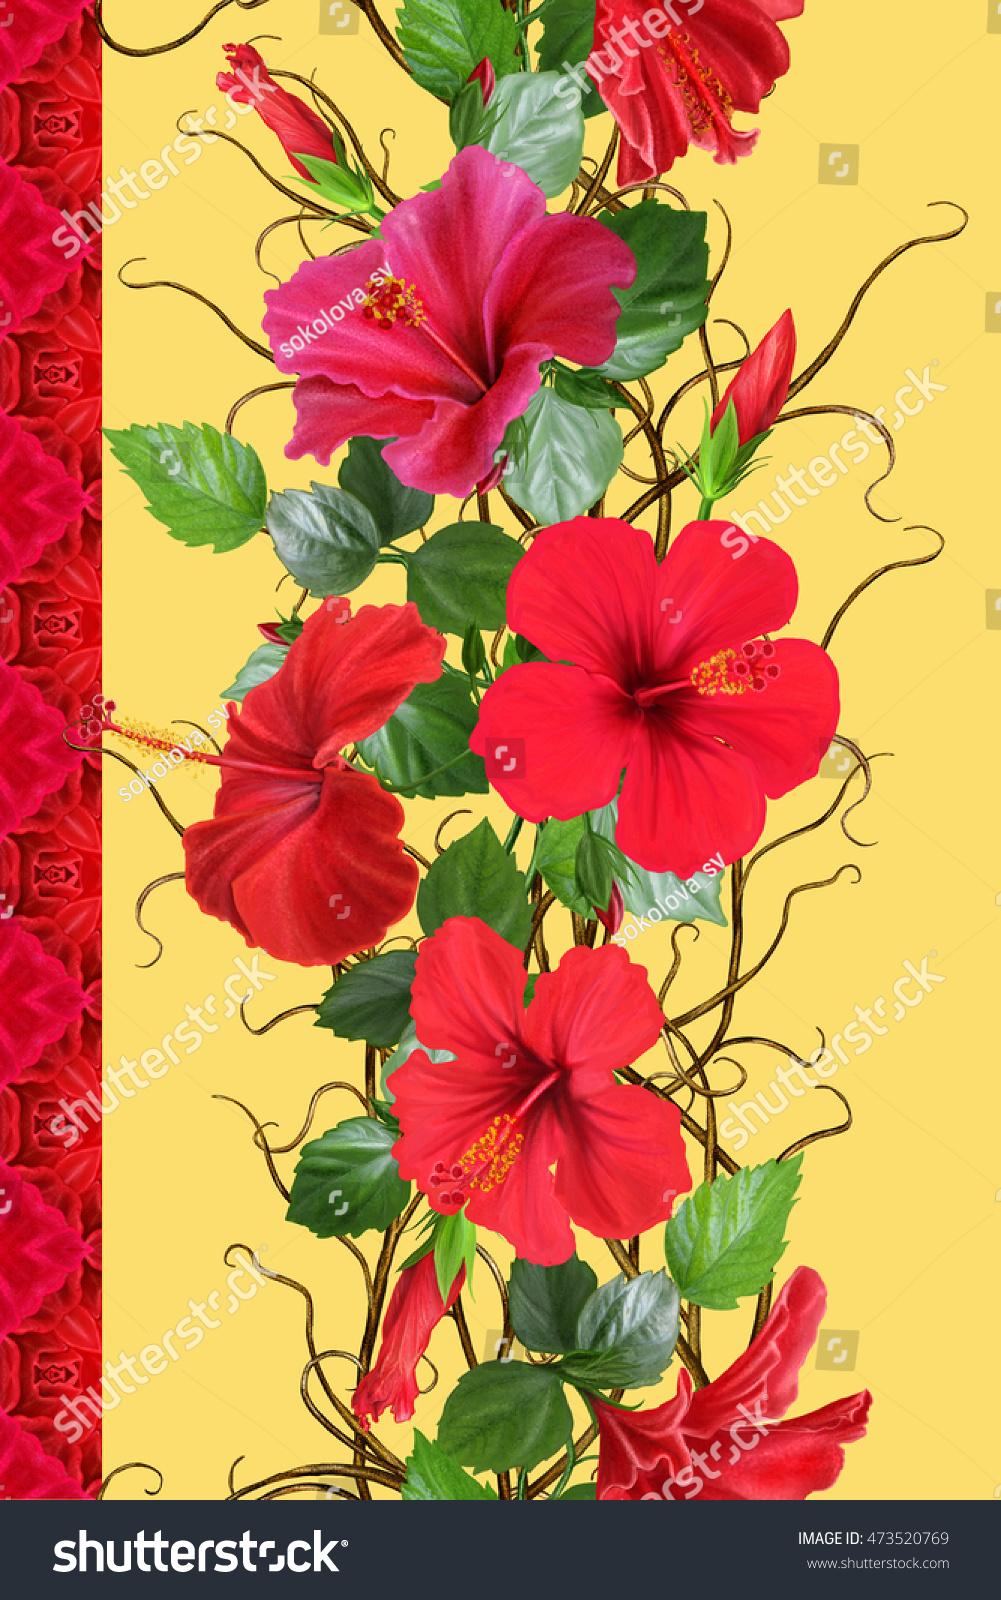 Vertical floral border pattern seamless flower stock illustration vertical floral border pattern seamless flower garland weaving of thin branches izmirmasajfo Gallery